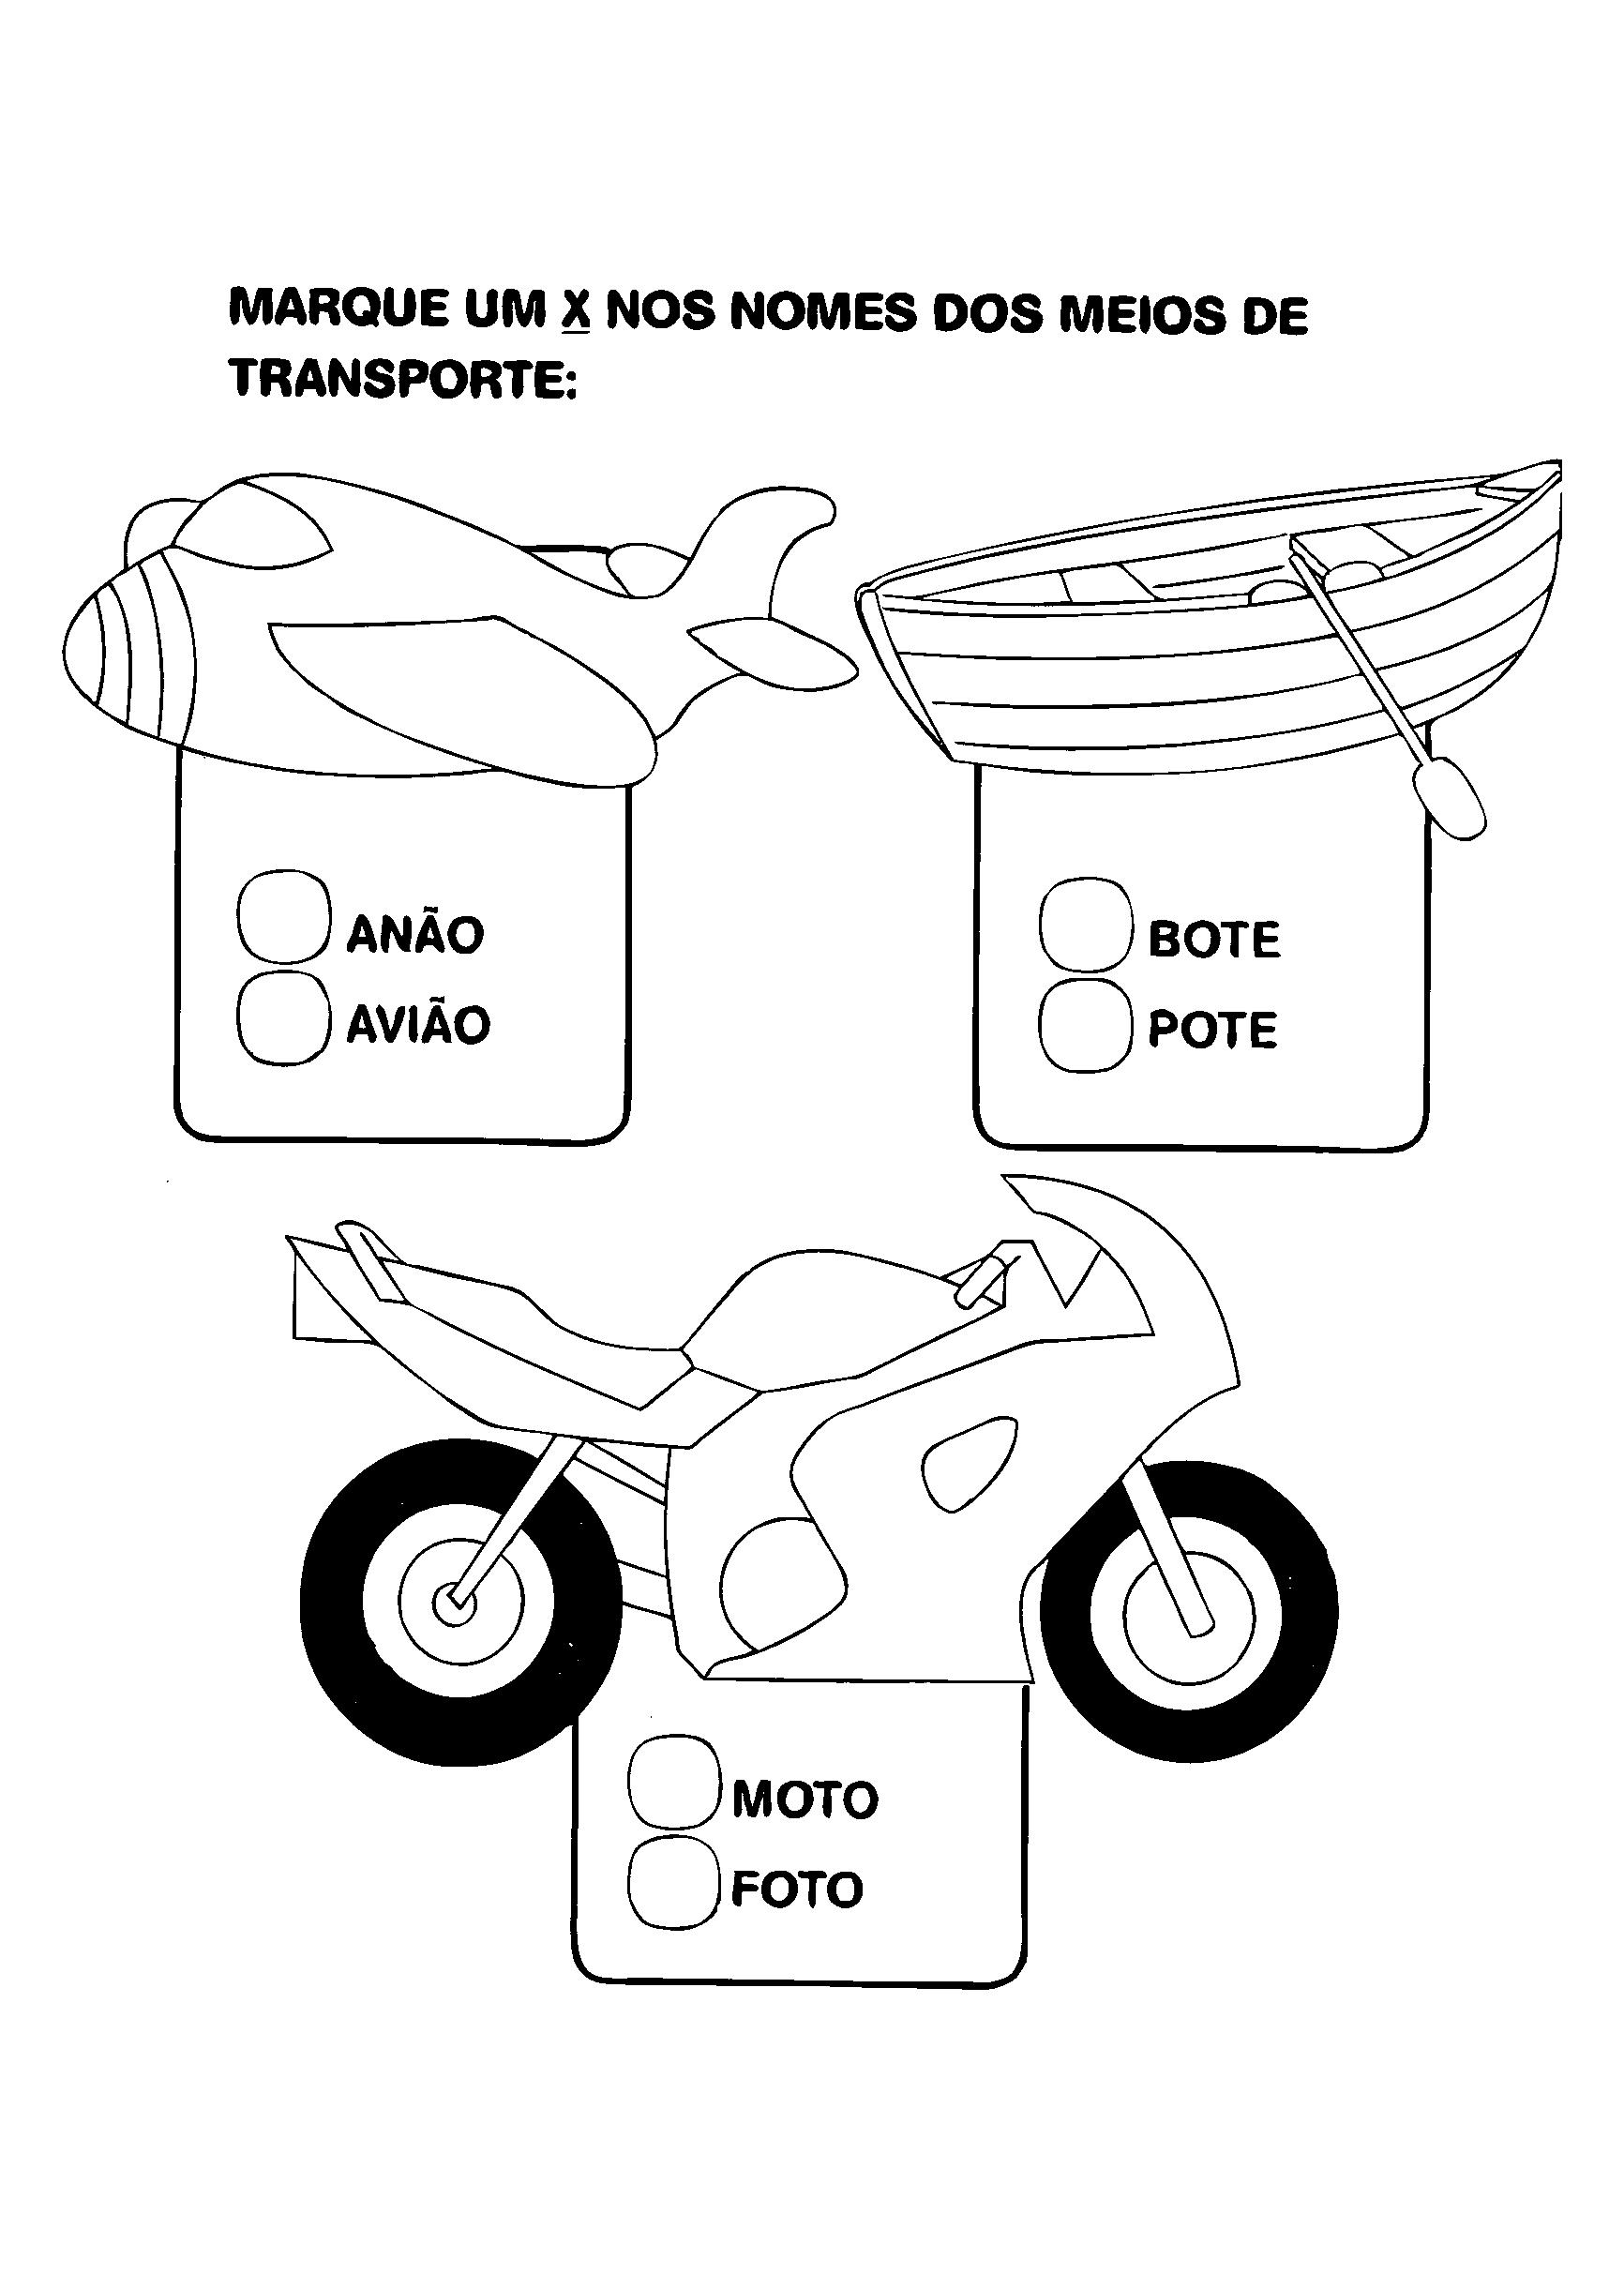 0265-meios-transporte-marcar-nomes